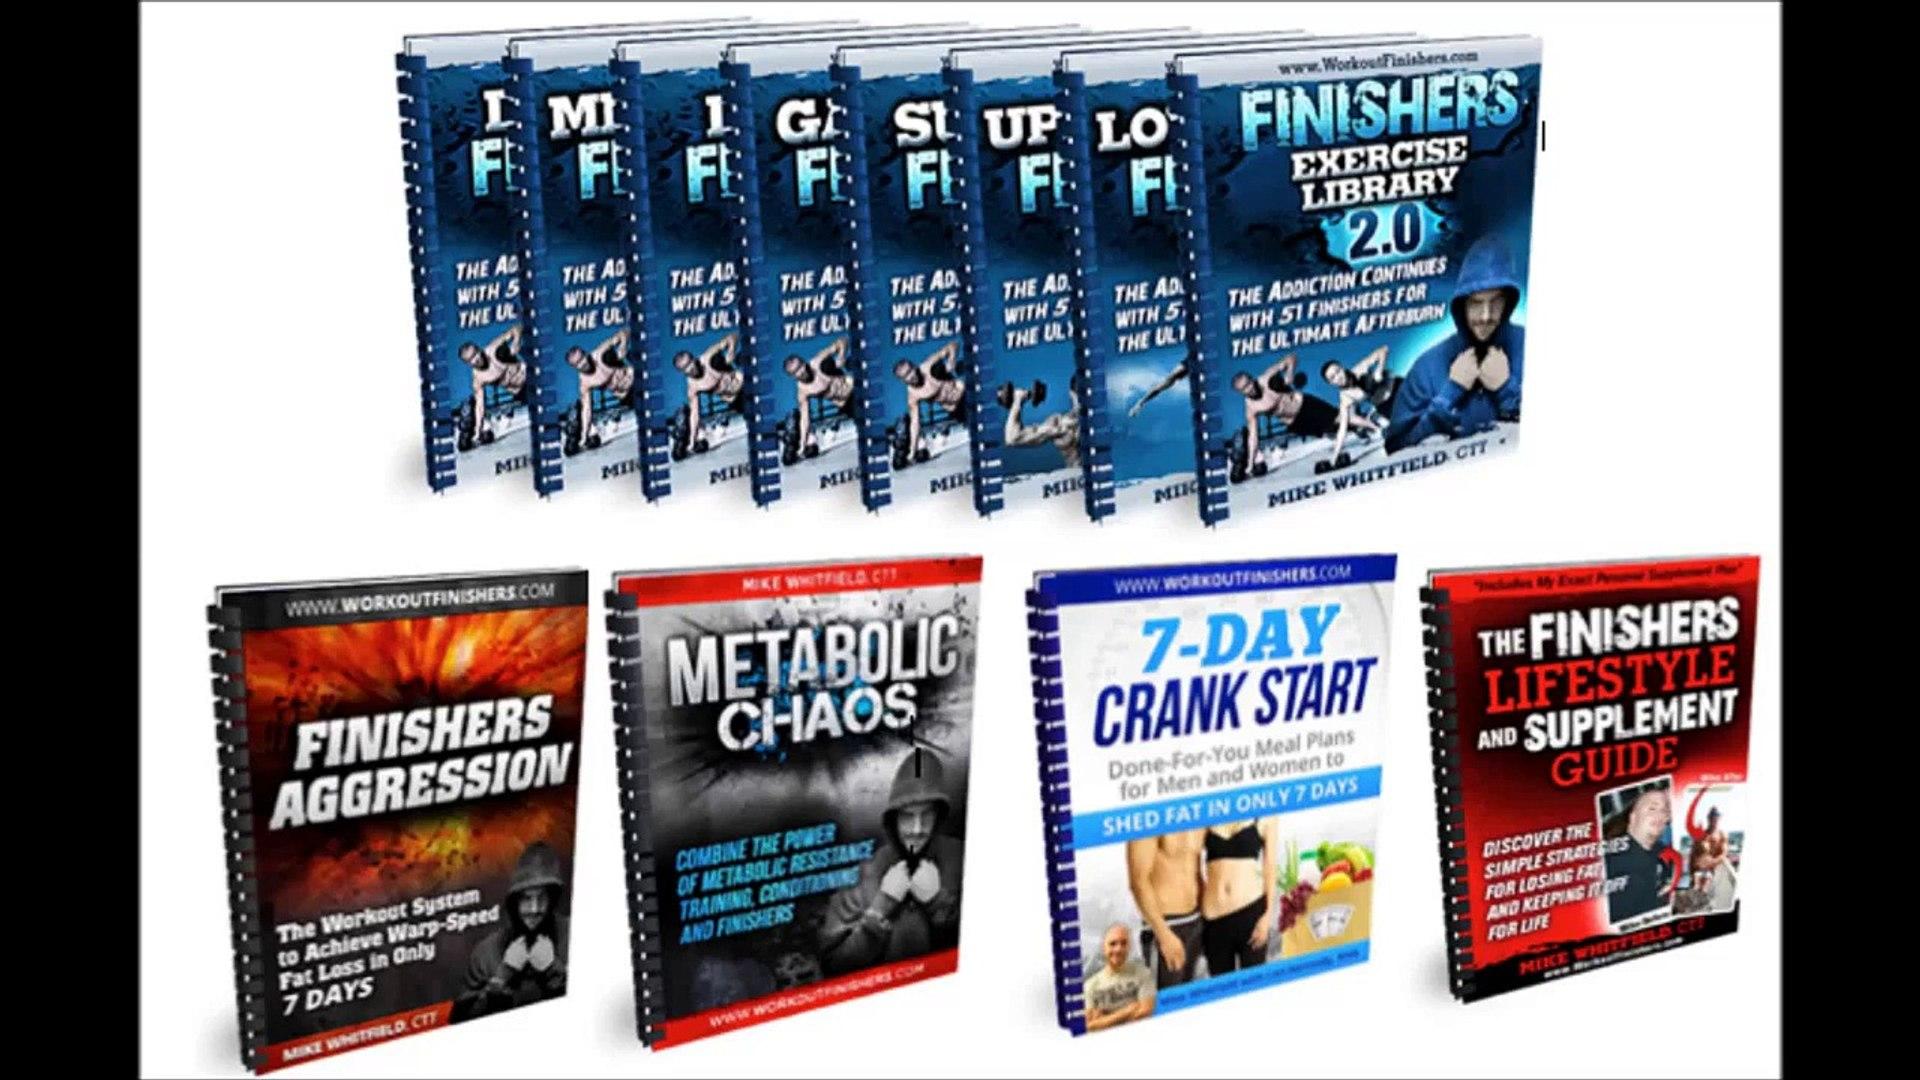 workout finishers 2 0 pdf   workout finishers 2.0 review